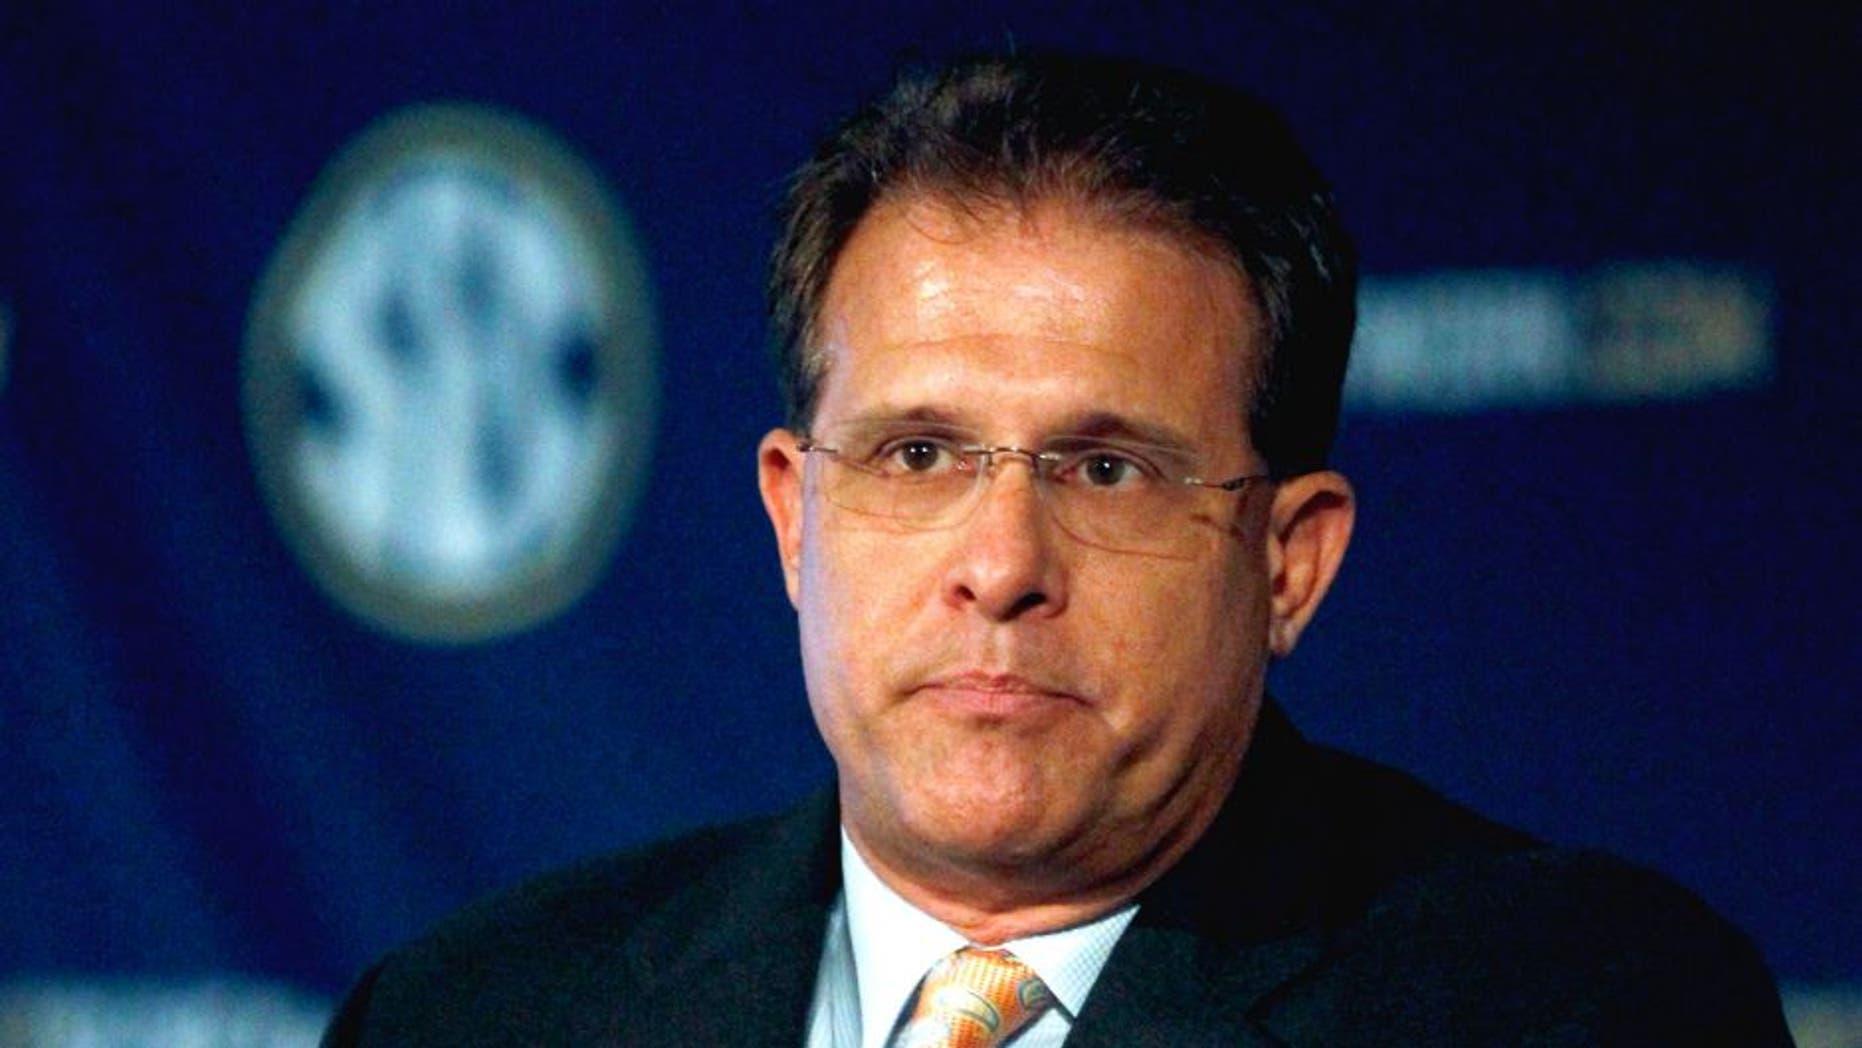 Auburn coach Gus Malzahn speaks during SEC media days on Monday, July 14, 2014, in Hoover, Ala. (AP Photo/Butch Dill)